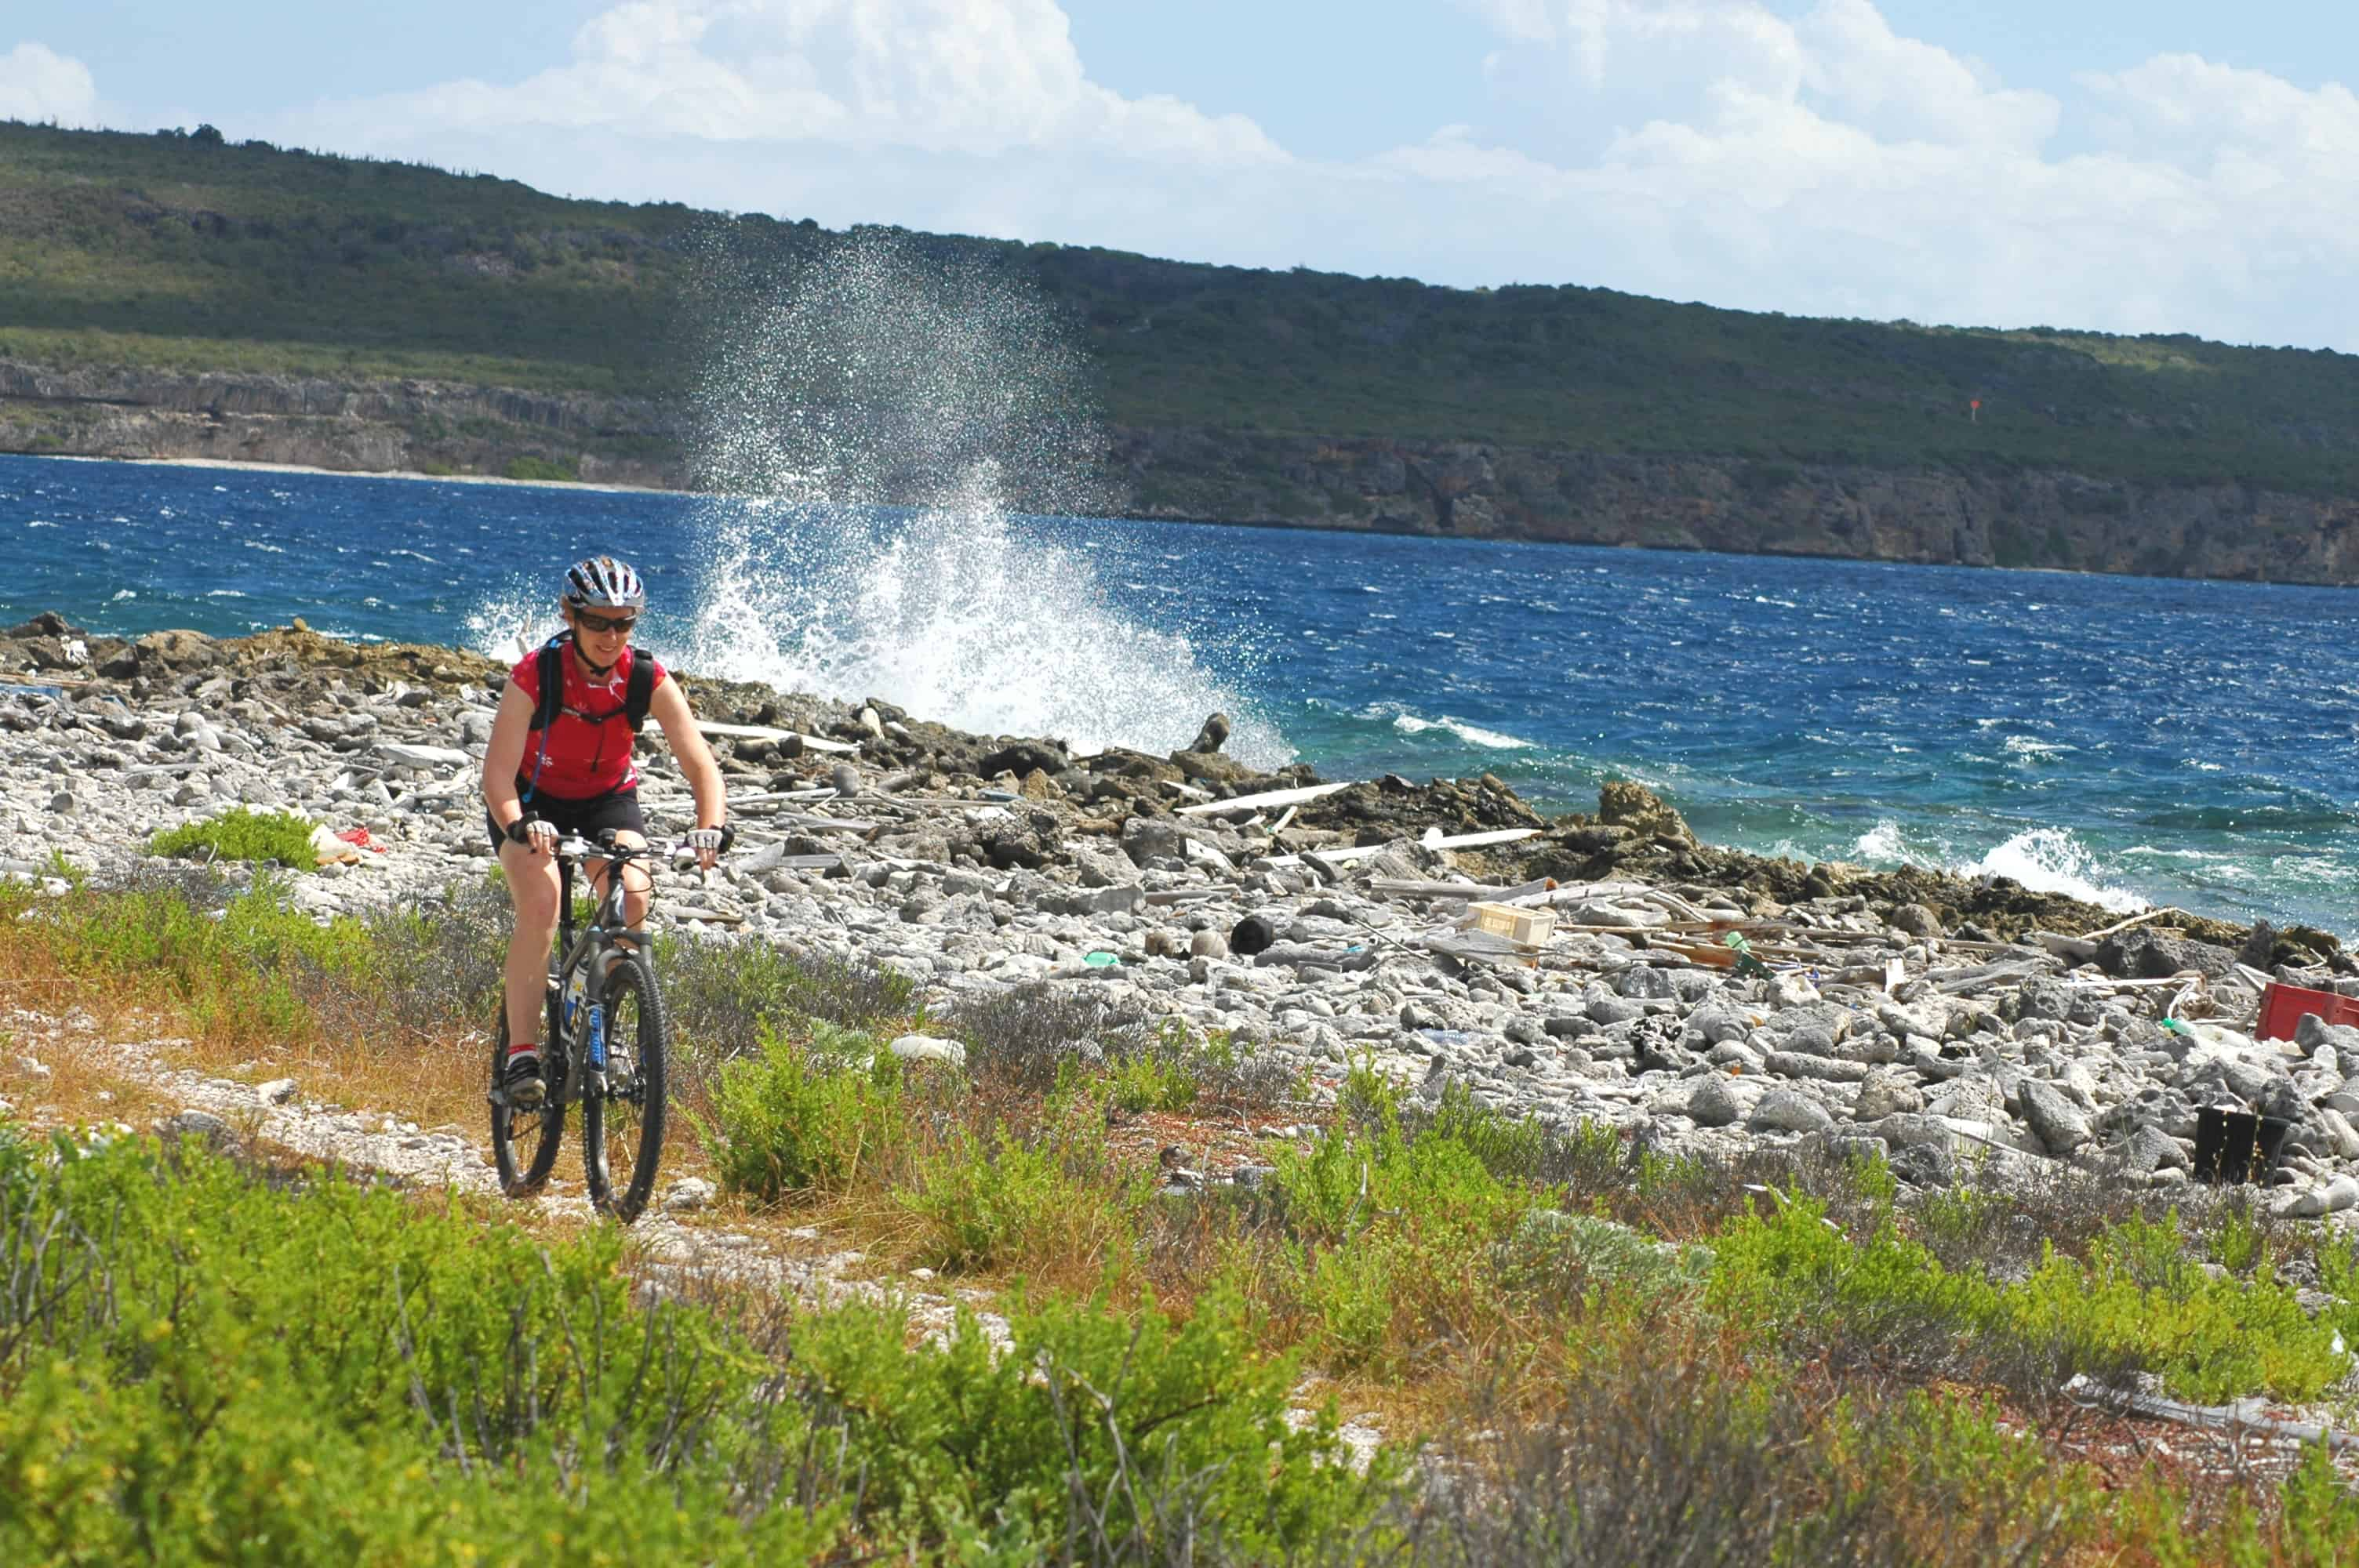 Mountain Bike Curacao 4- on the Caribbean island of Curacao, Netherlands Antilles